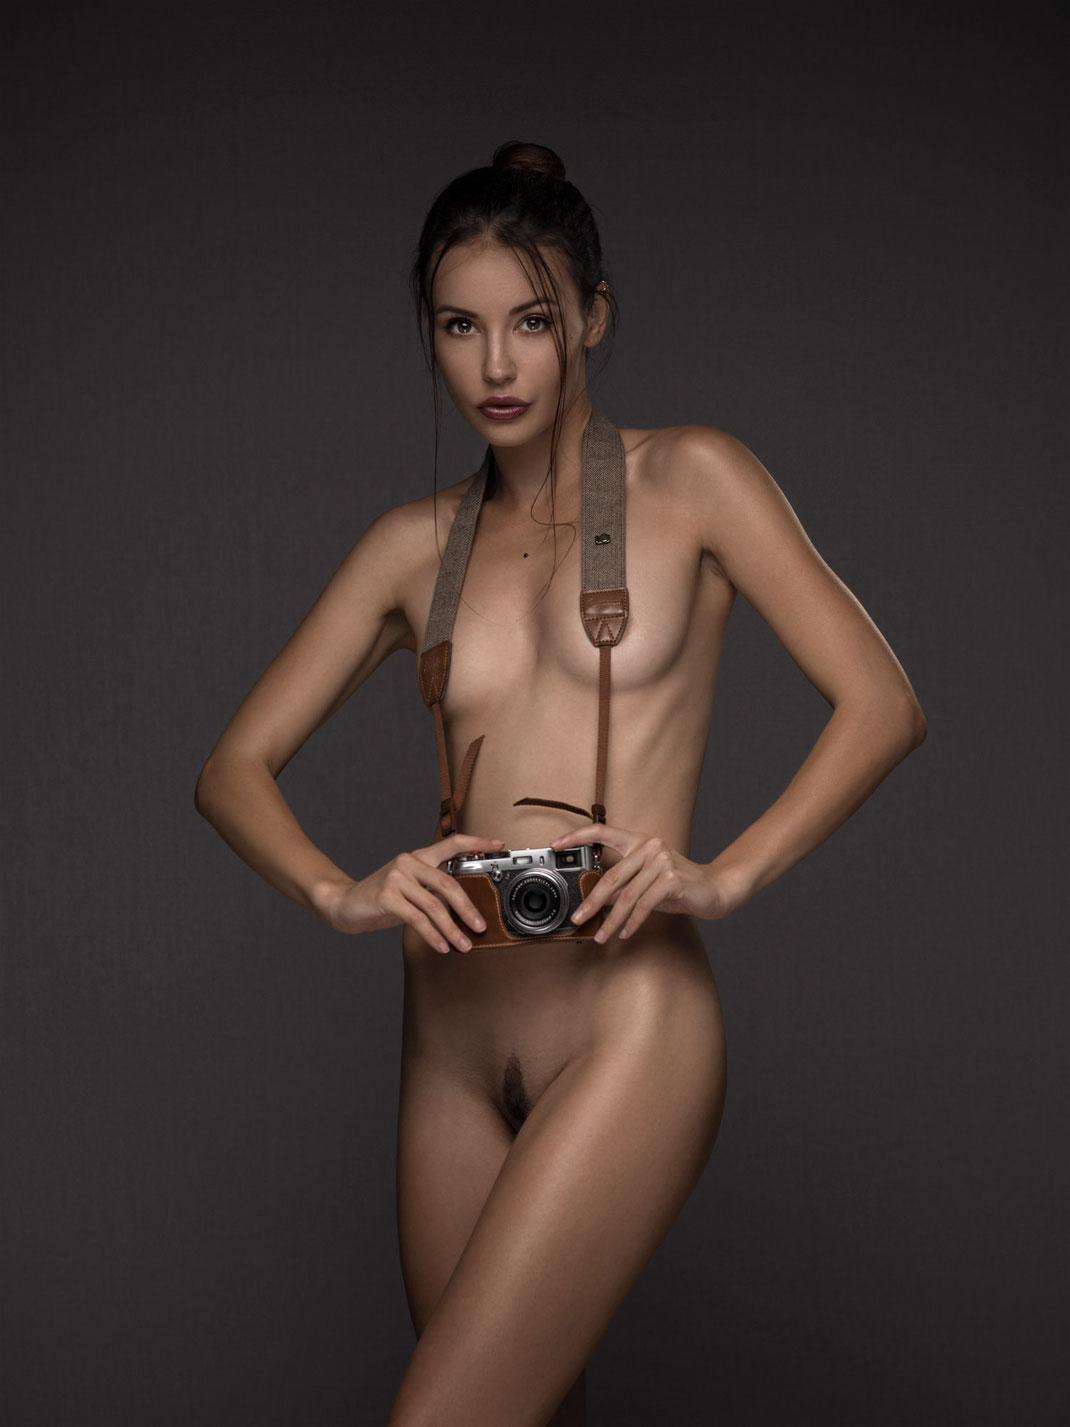 Two Beauties - Eliska & Fuji X100s  - Markus Hertzsch - Camera - Girl